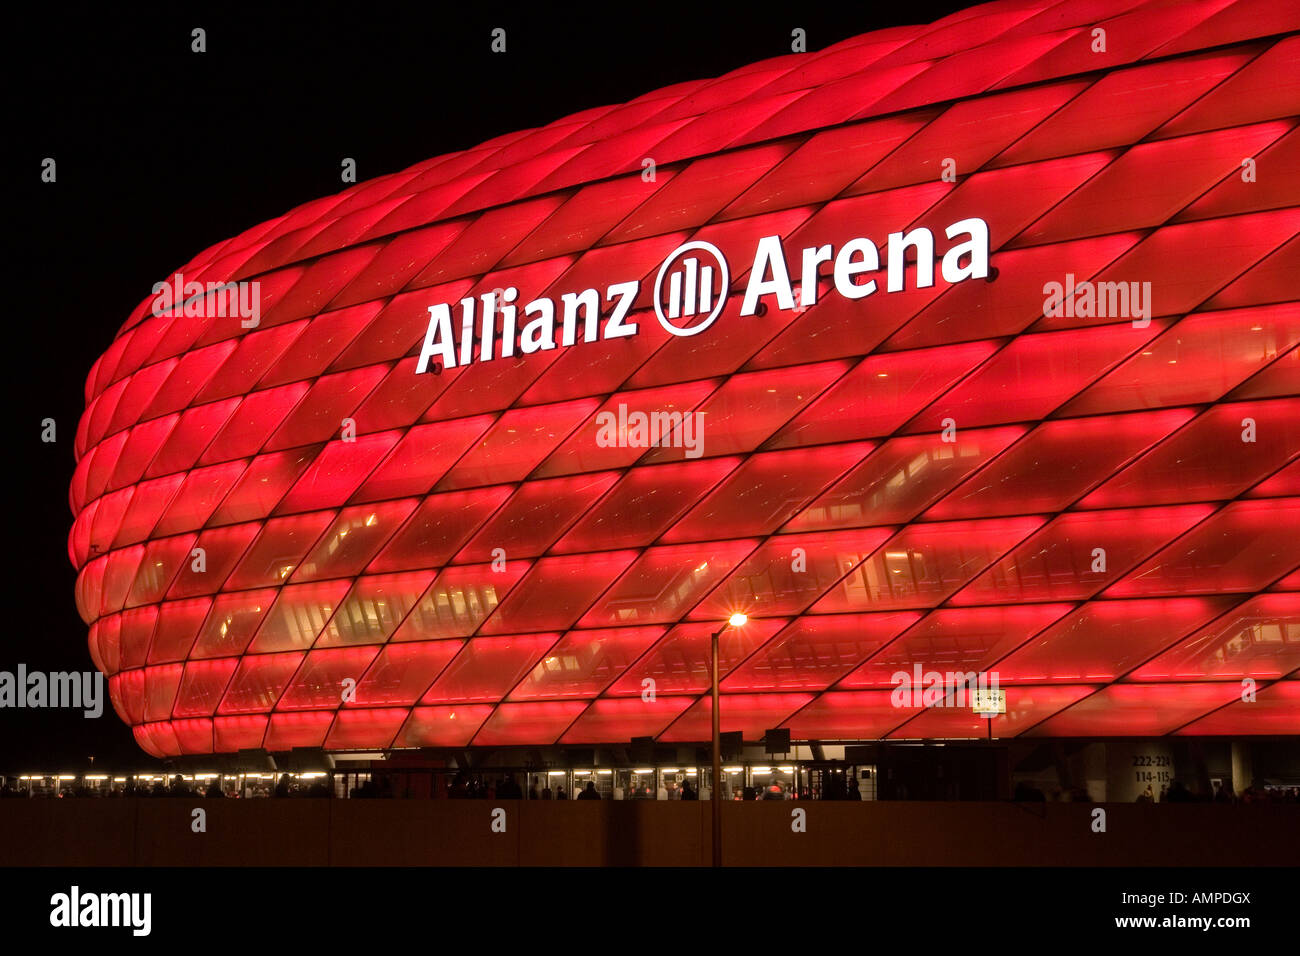 Germany Bavaria Munich The illuminated football stadion Allianz Arena at night game for UEFA Pokal at 08 11 2007 - Stock Image